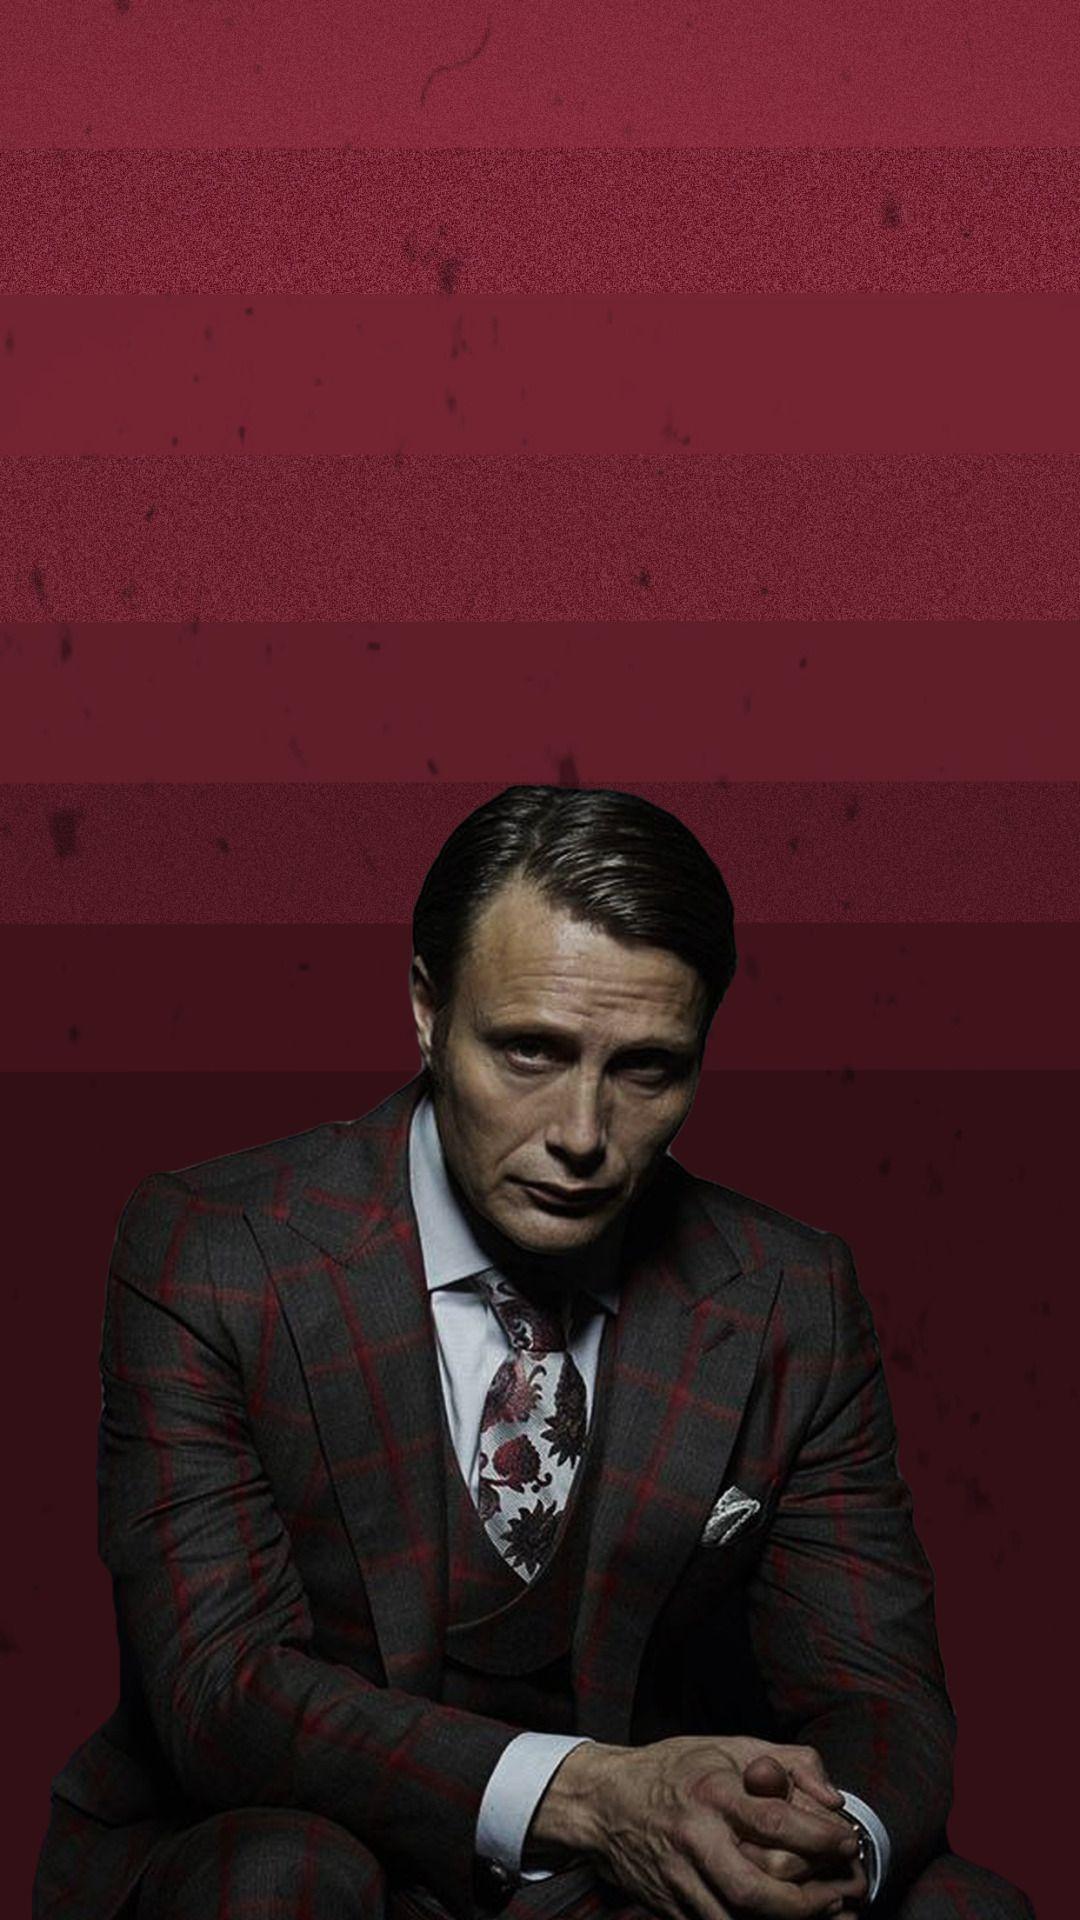 Pin On Hannibal Lecter Mads Mikkelsen